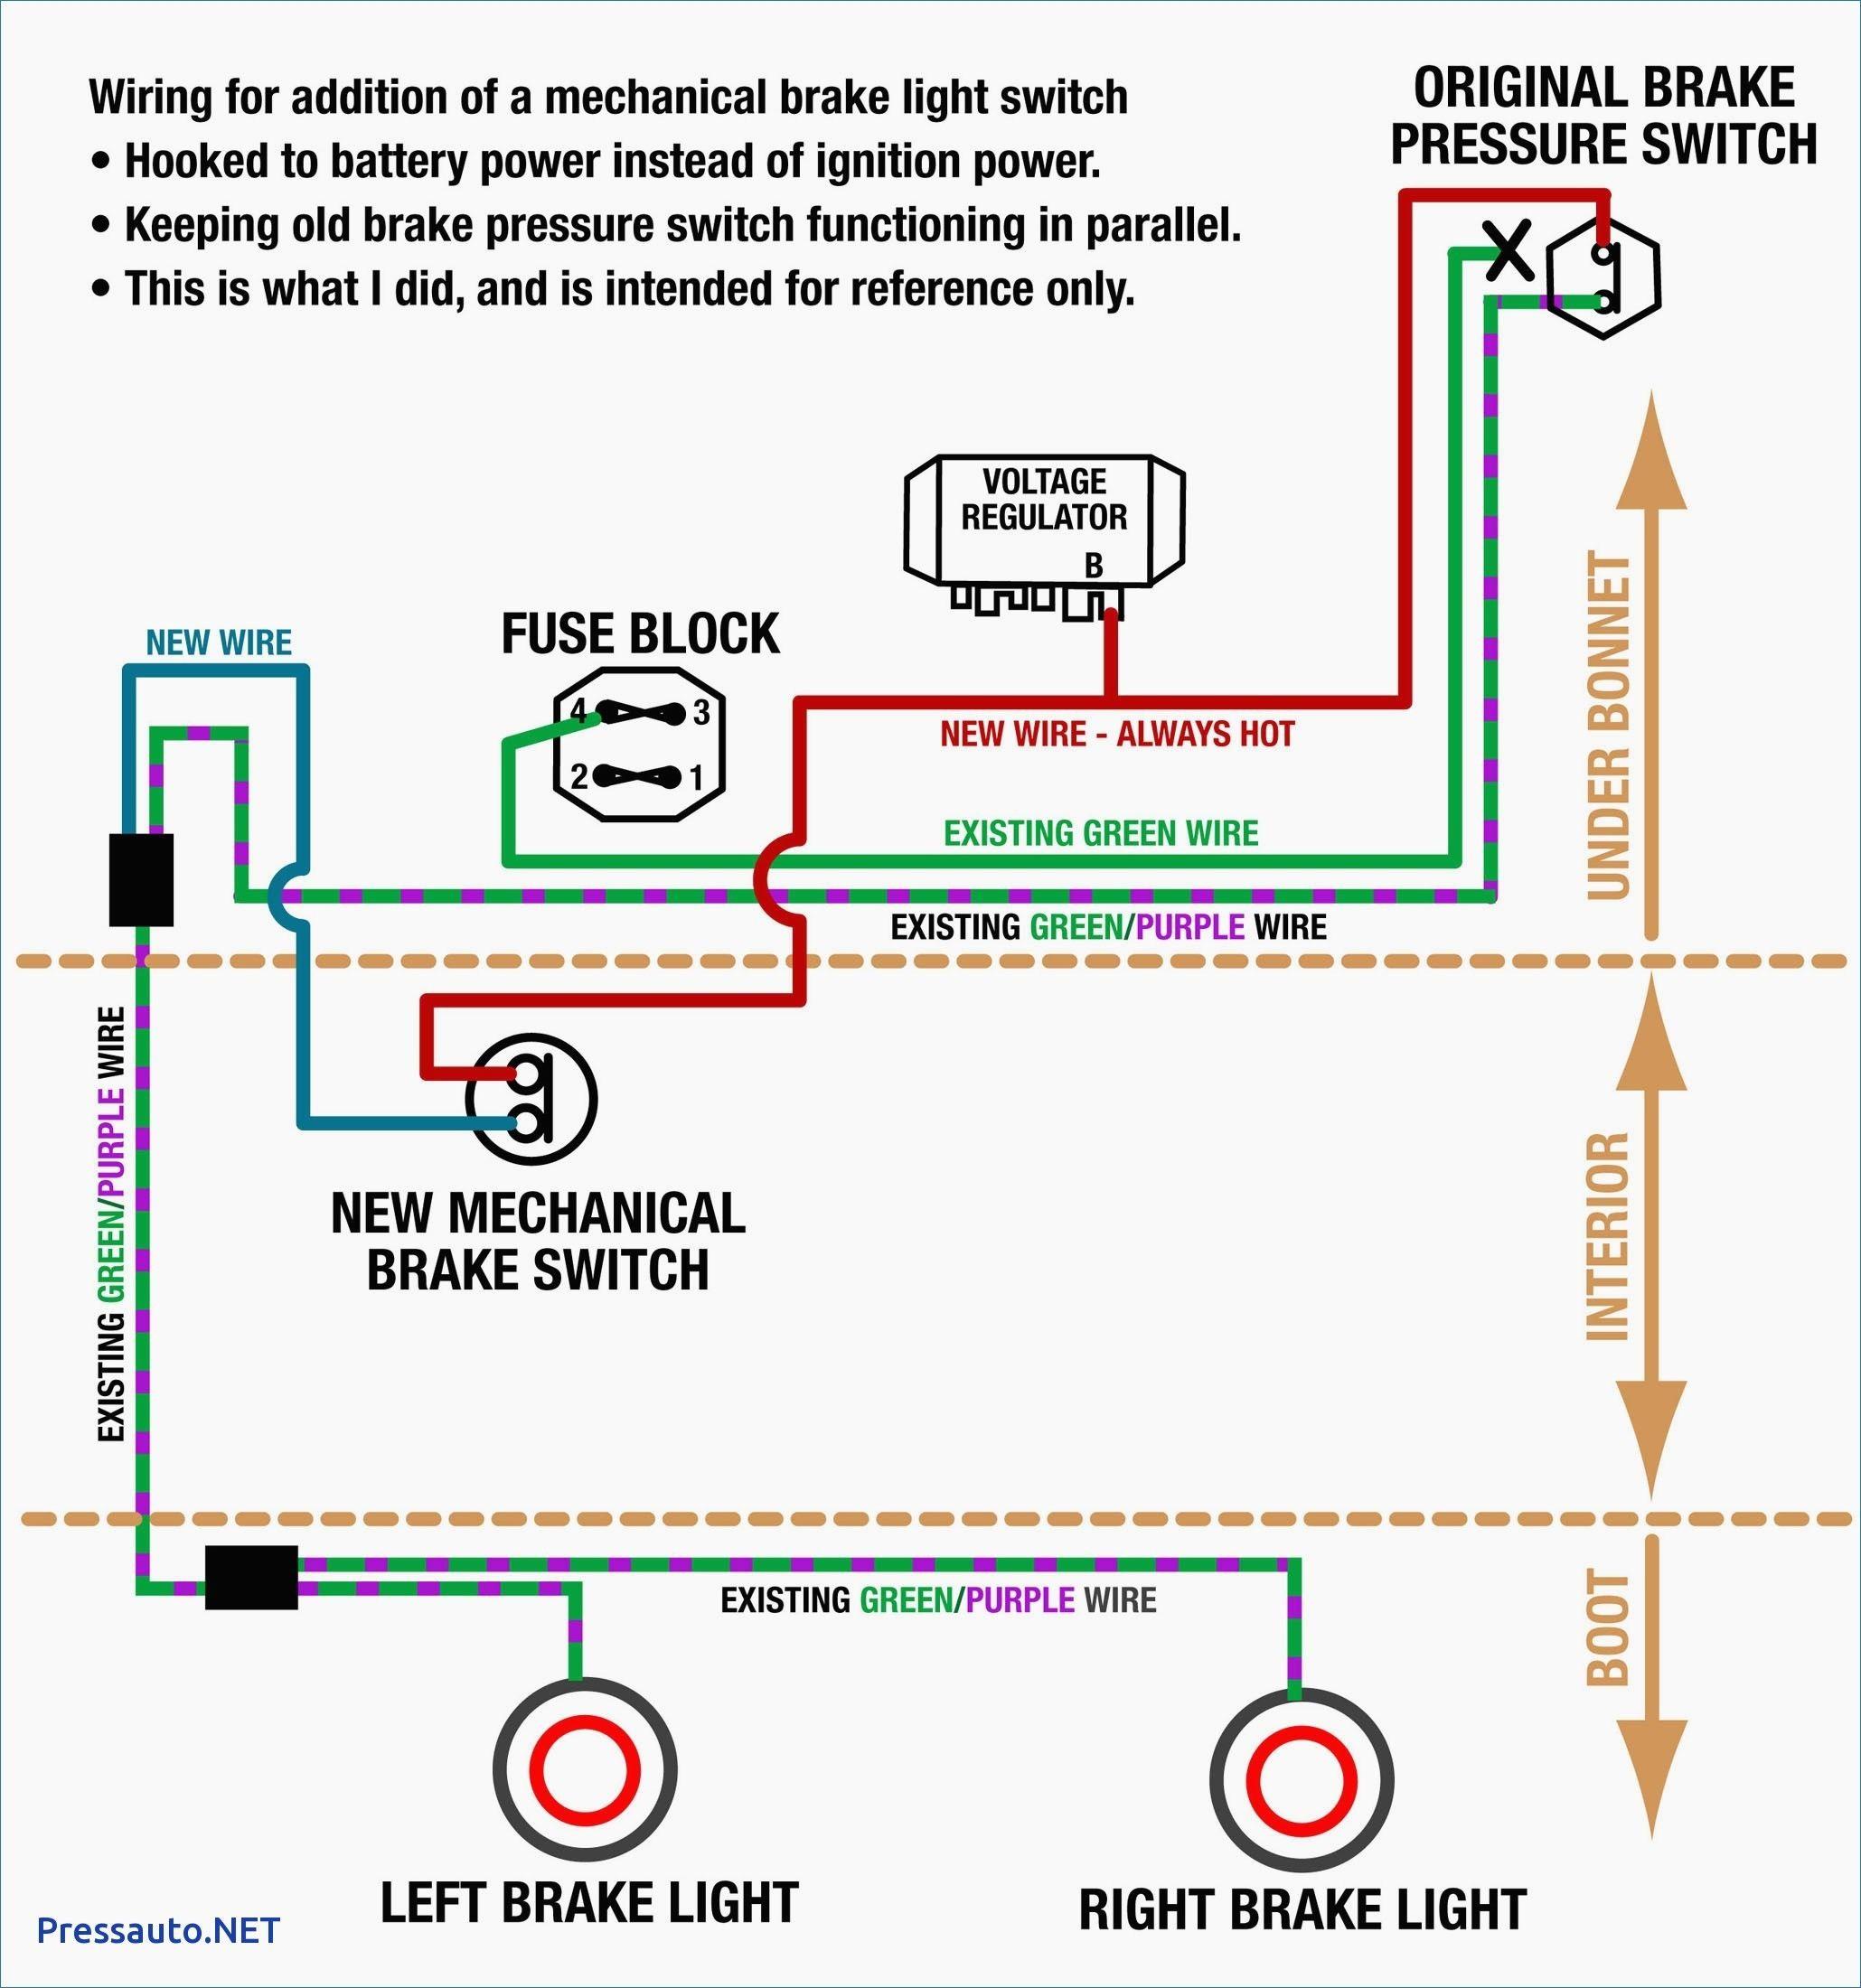 مخطط الأسلاك Roc Grp Org Light Switch Wiring Switch Words Light Switch